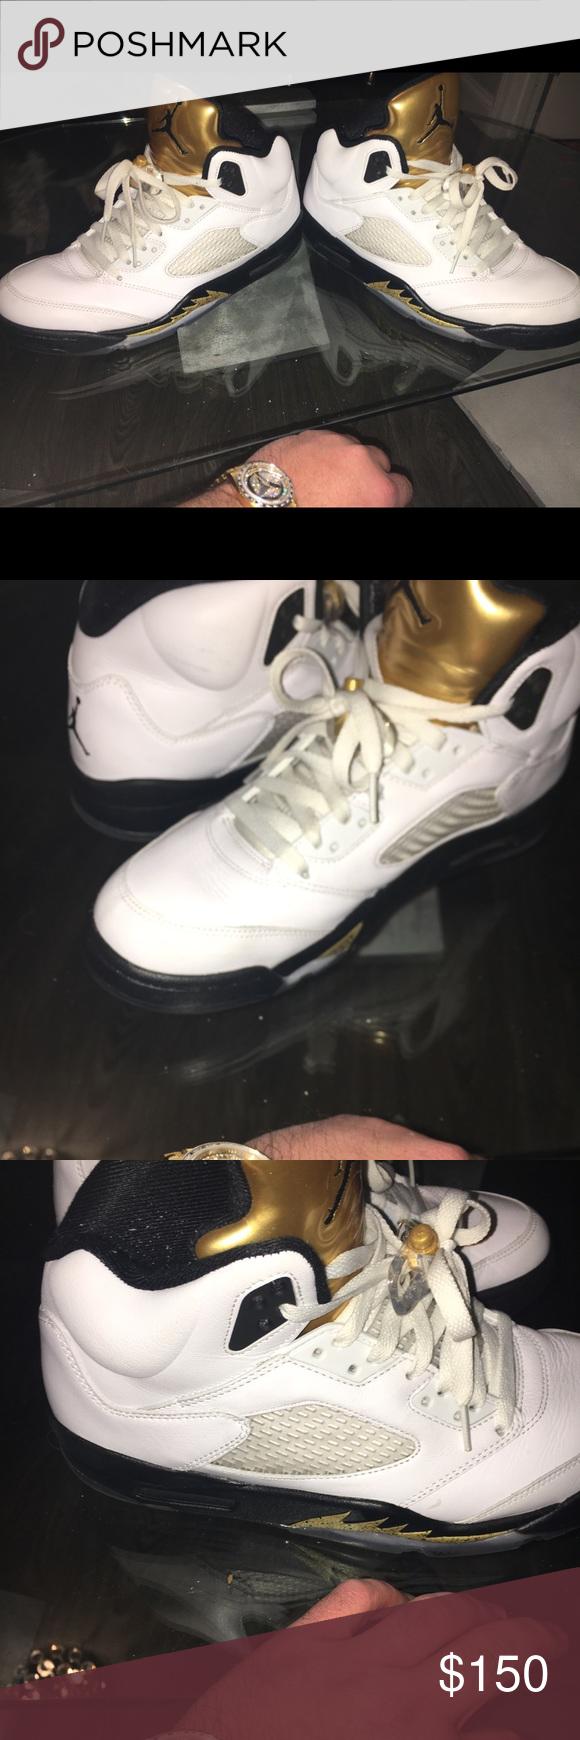 Jordan gold coin Size 10 Jordan gold coin 5s Nike Shoes Sneakers